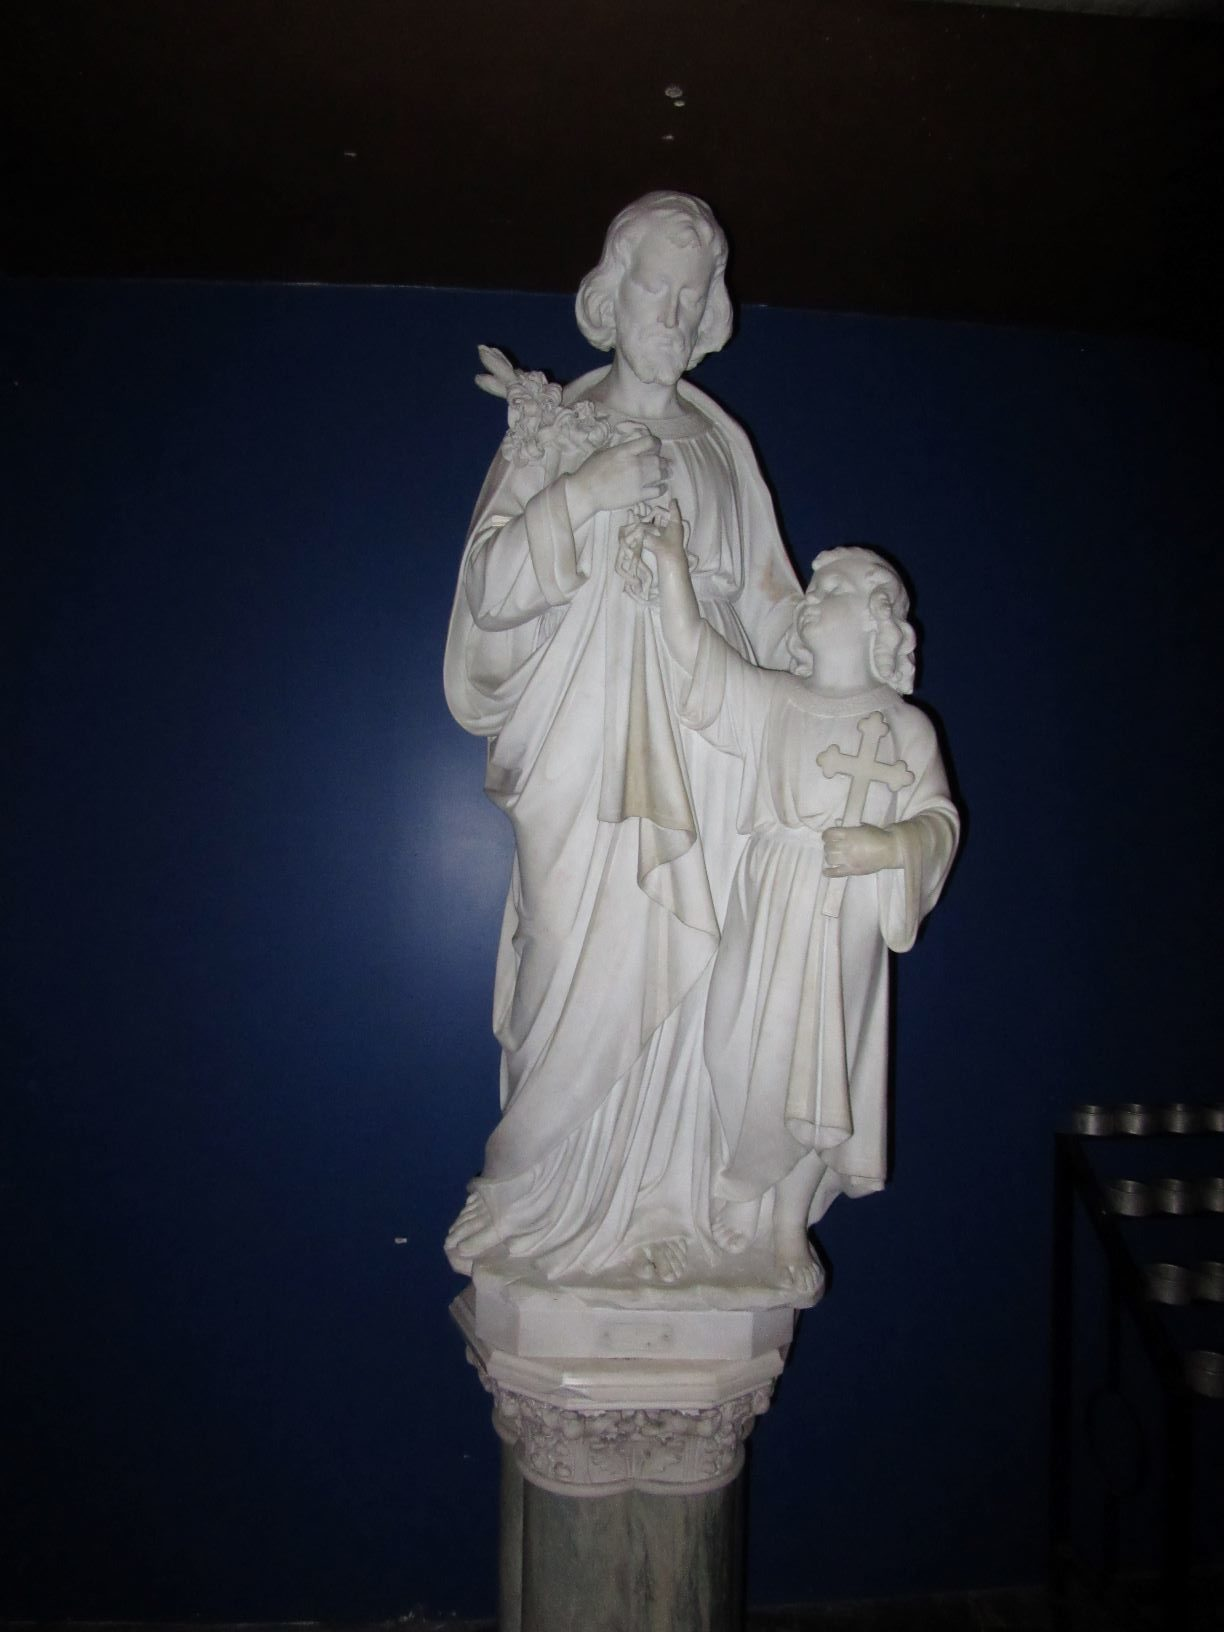 St. Joseph at Our Lady of Fatima Shrine